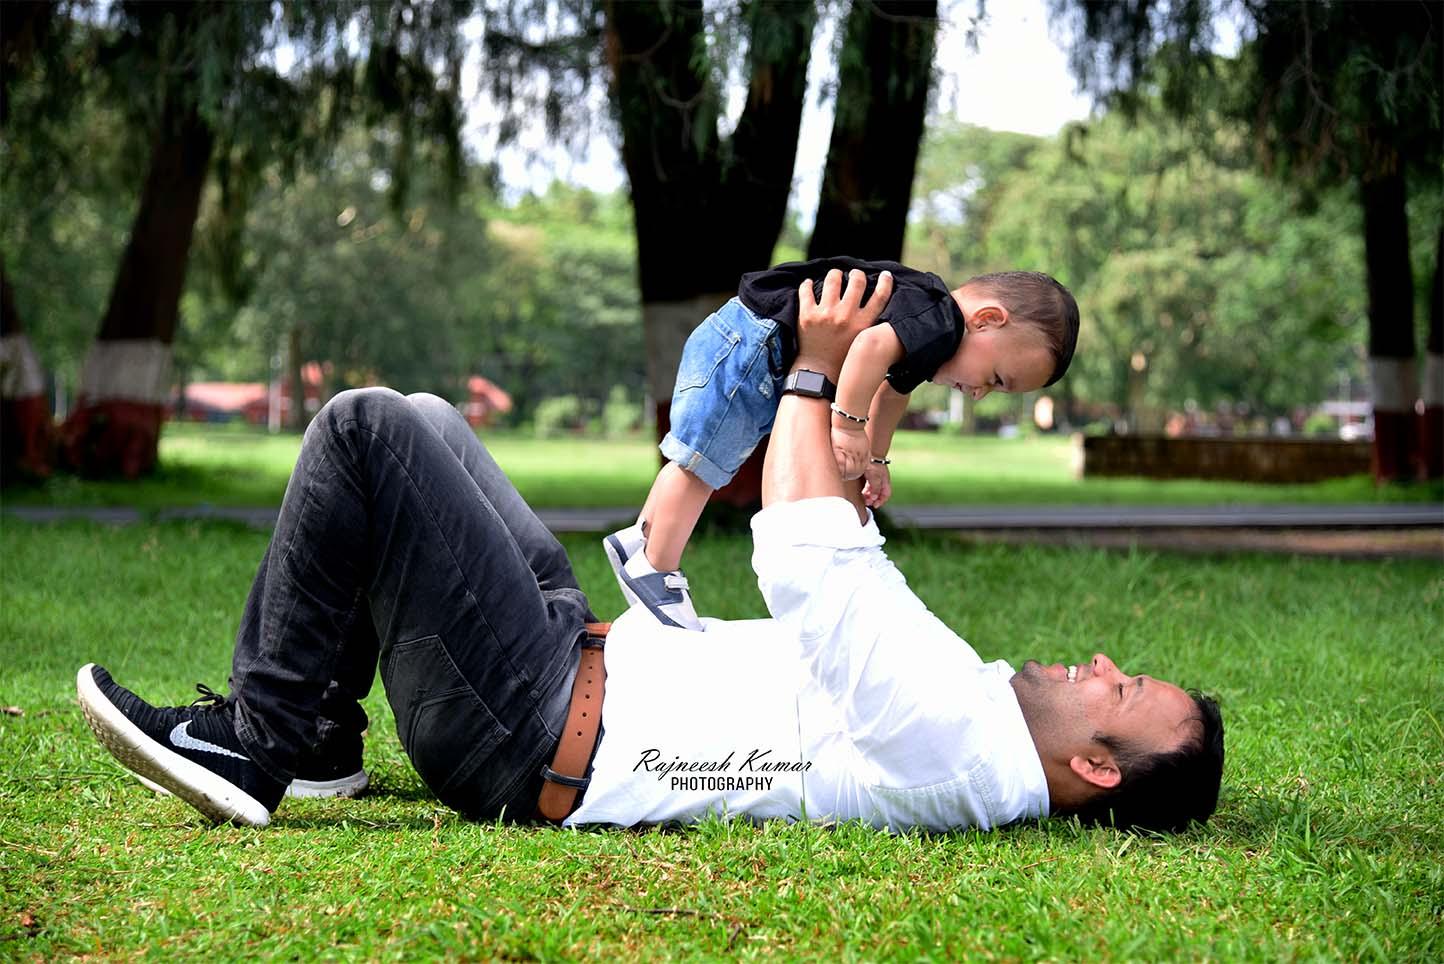 Best photography in dehradun -Rajneesh Photography26